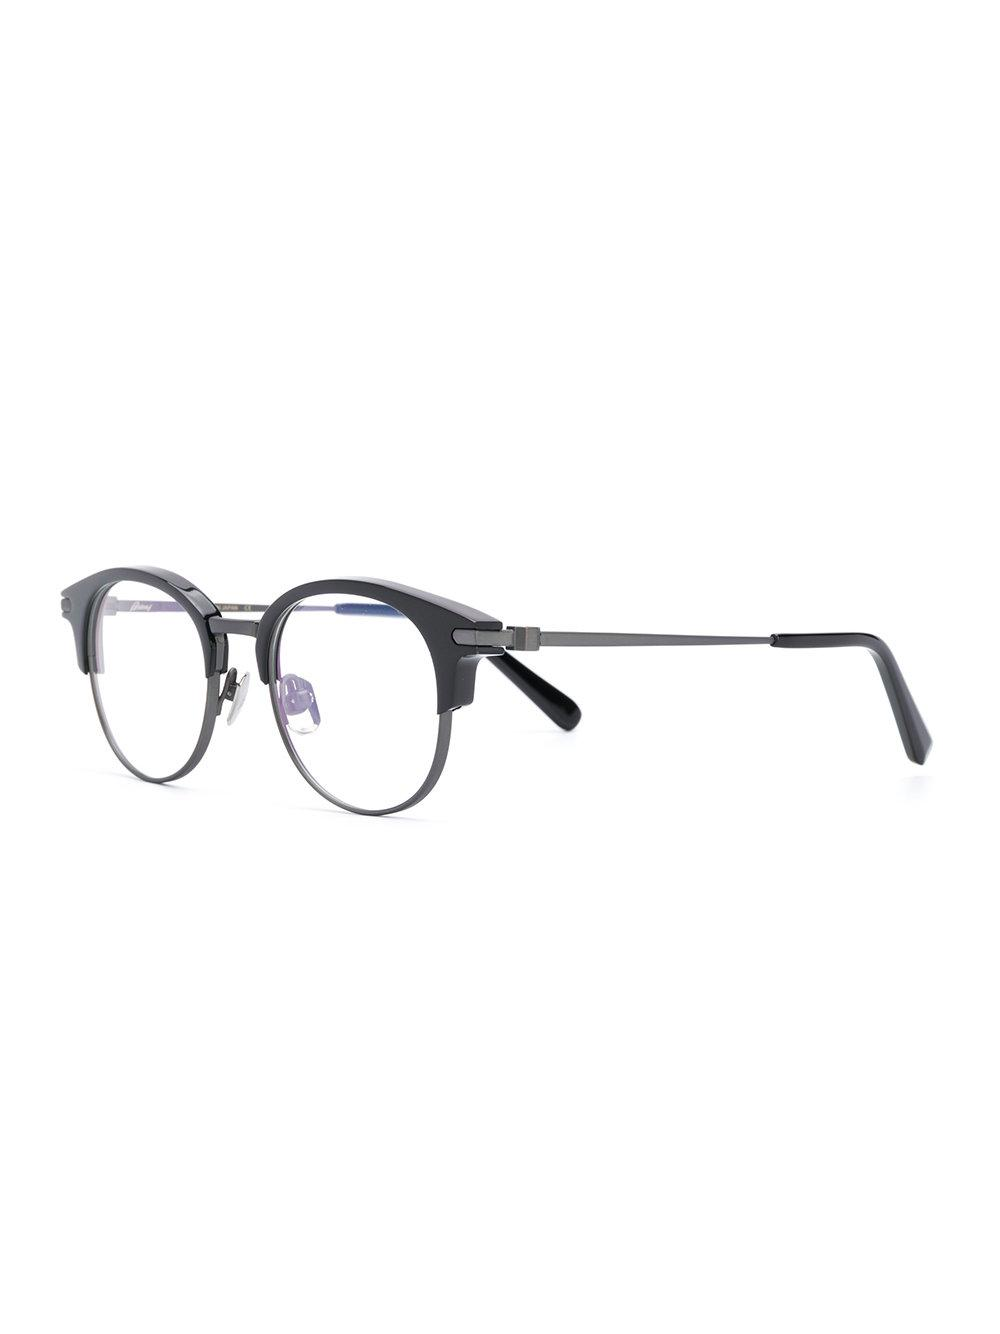 cdbfe52c17 Lyst - Brioni Round-frame Glasses in Black for Men